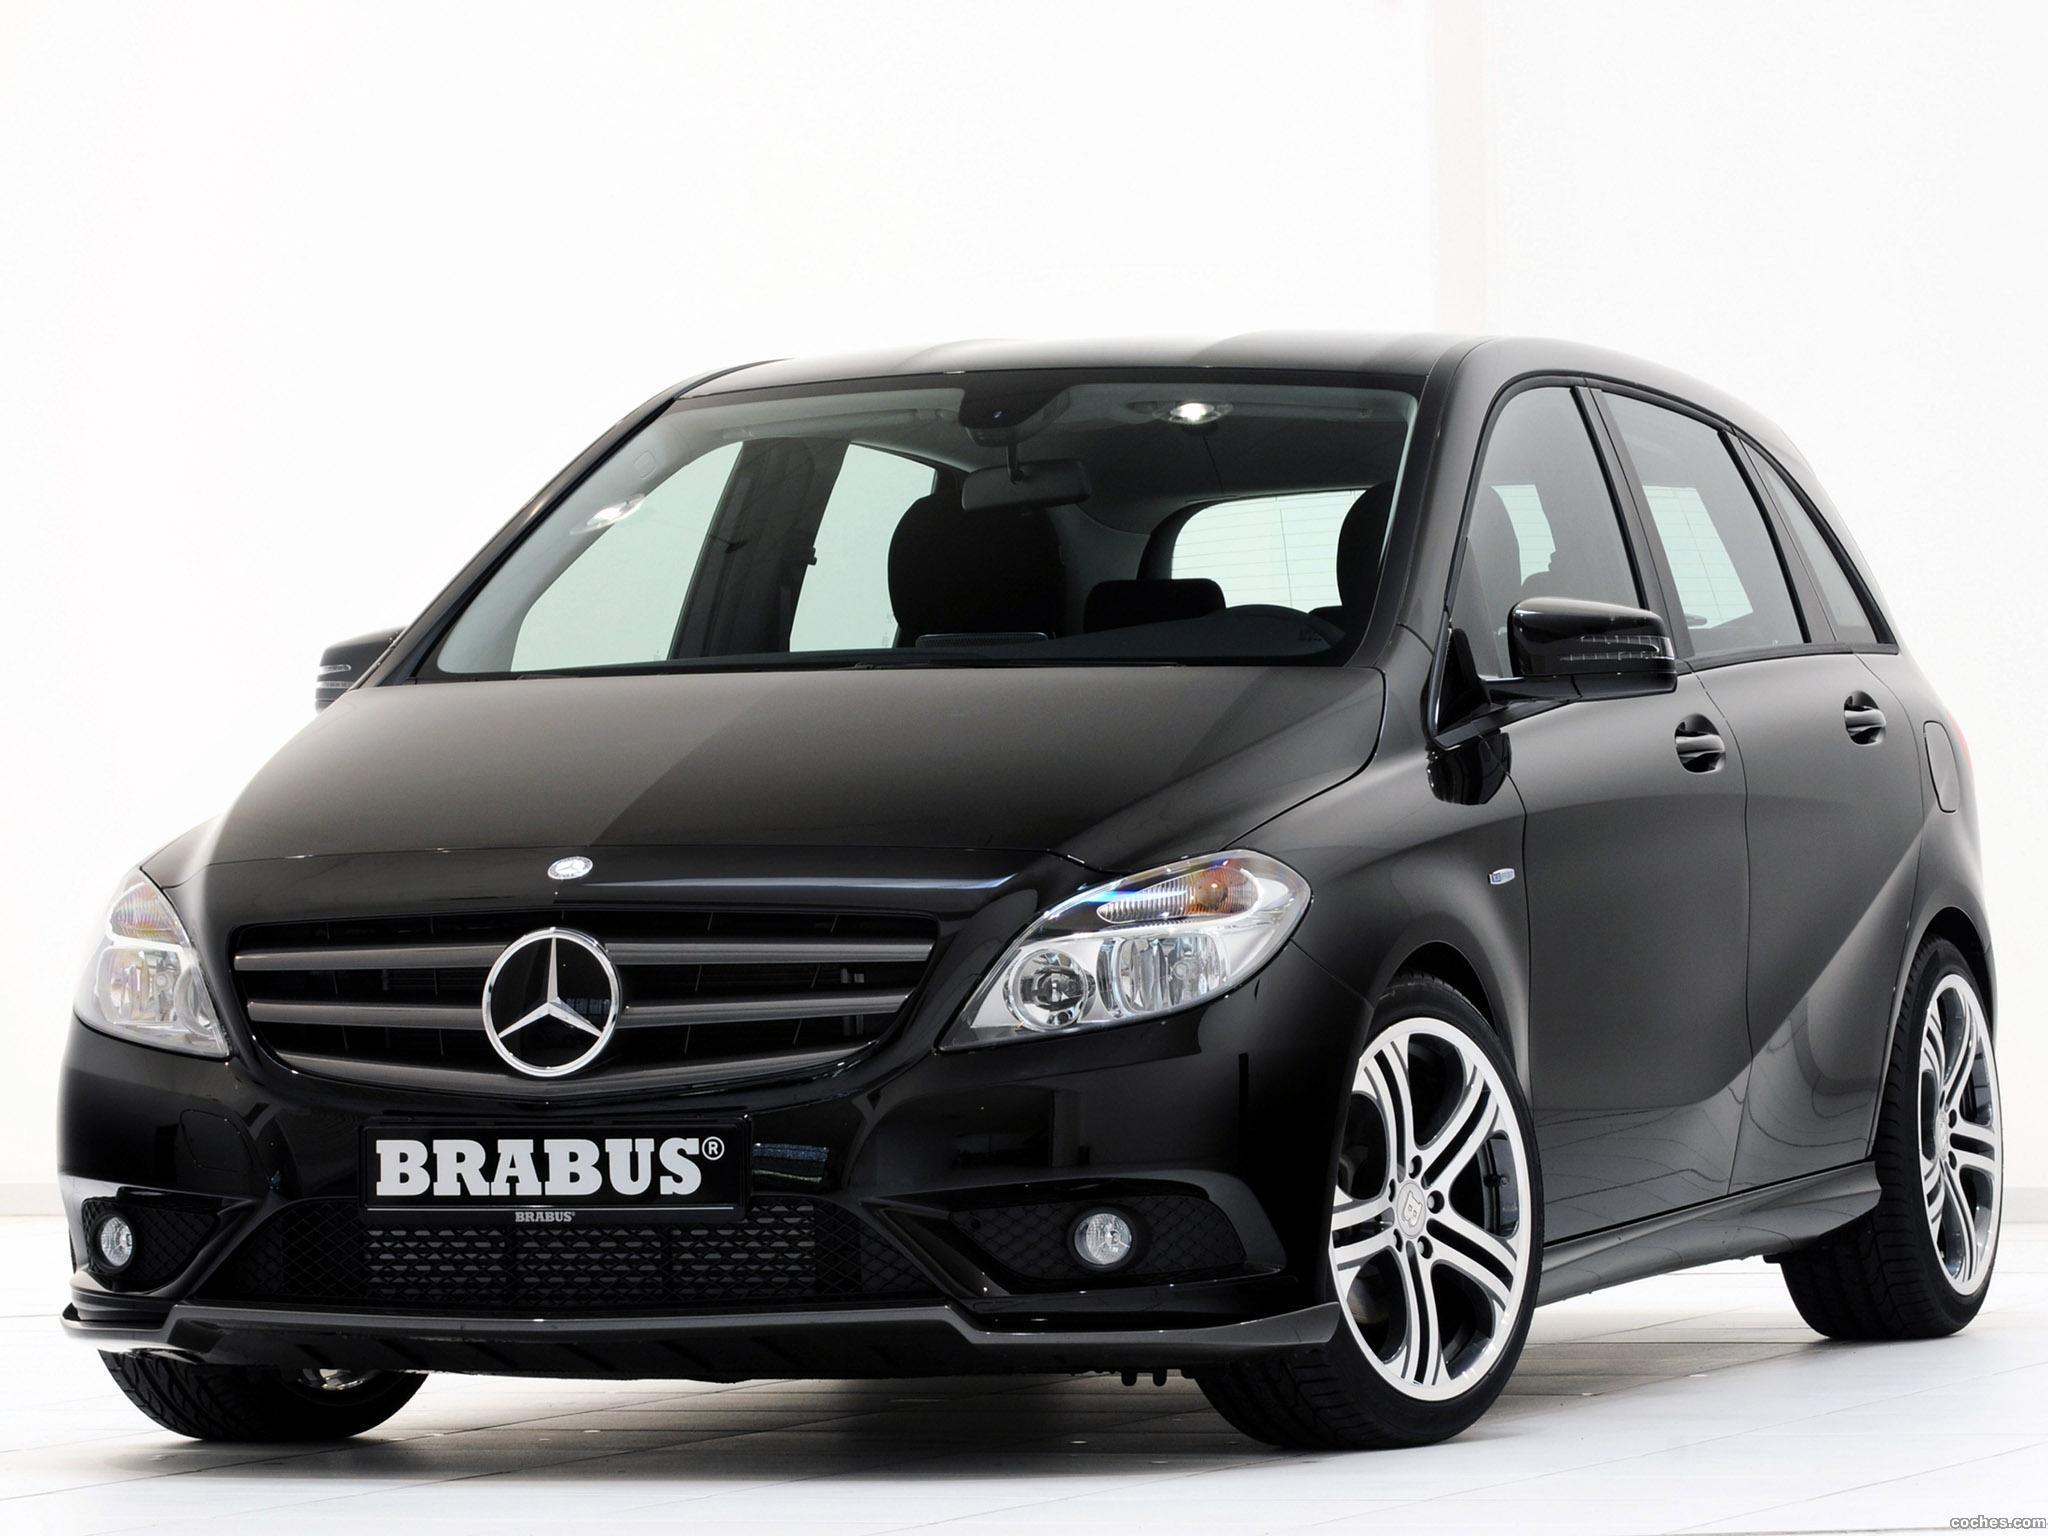 Foto 0 de Brabus Mercedes Clase B W246 2012